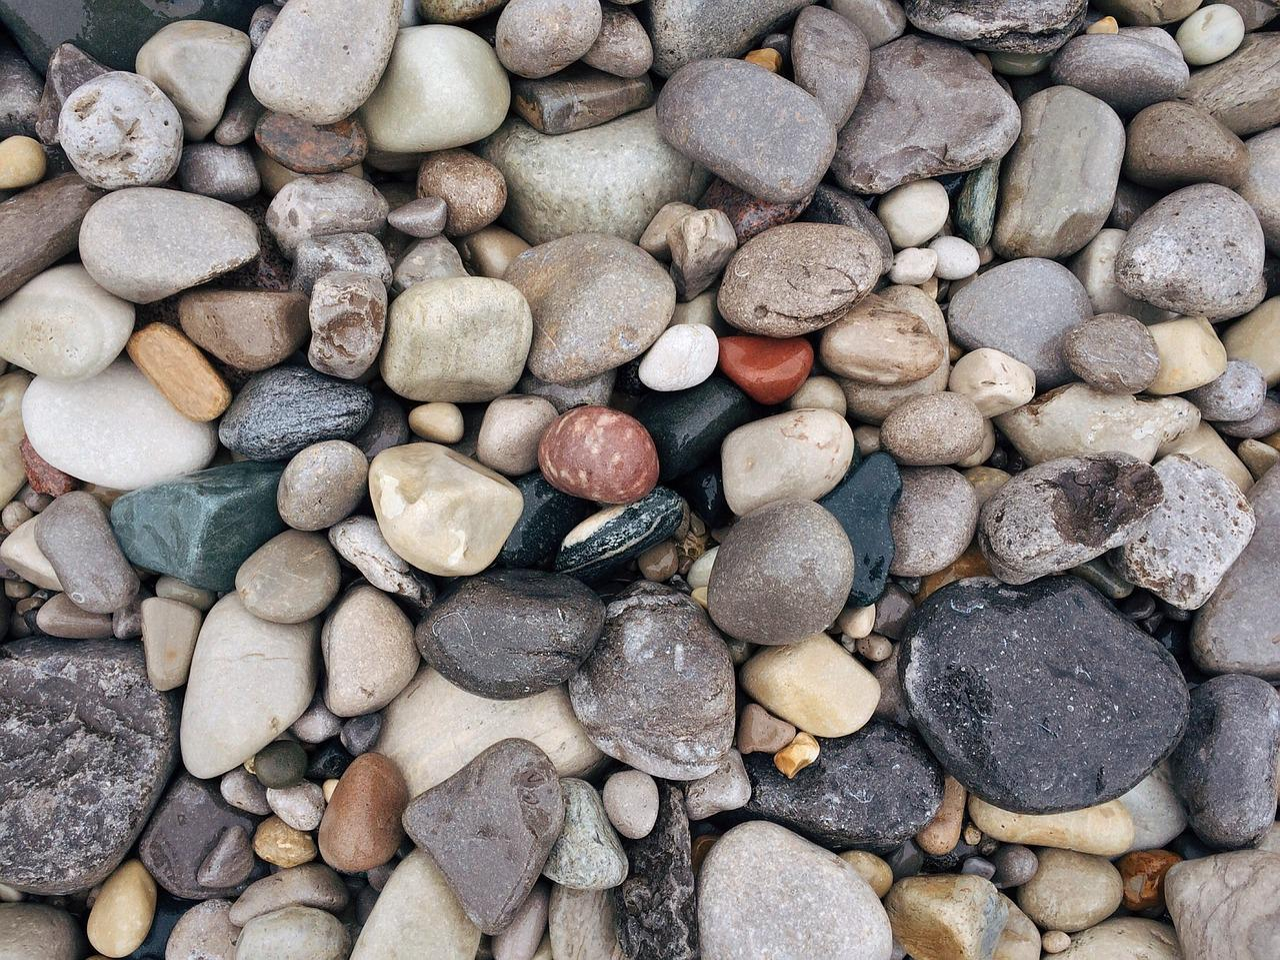 морские камни фото и описание среди окружающих помогут